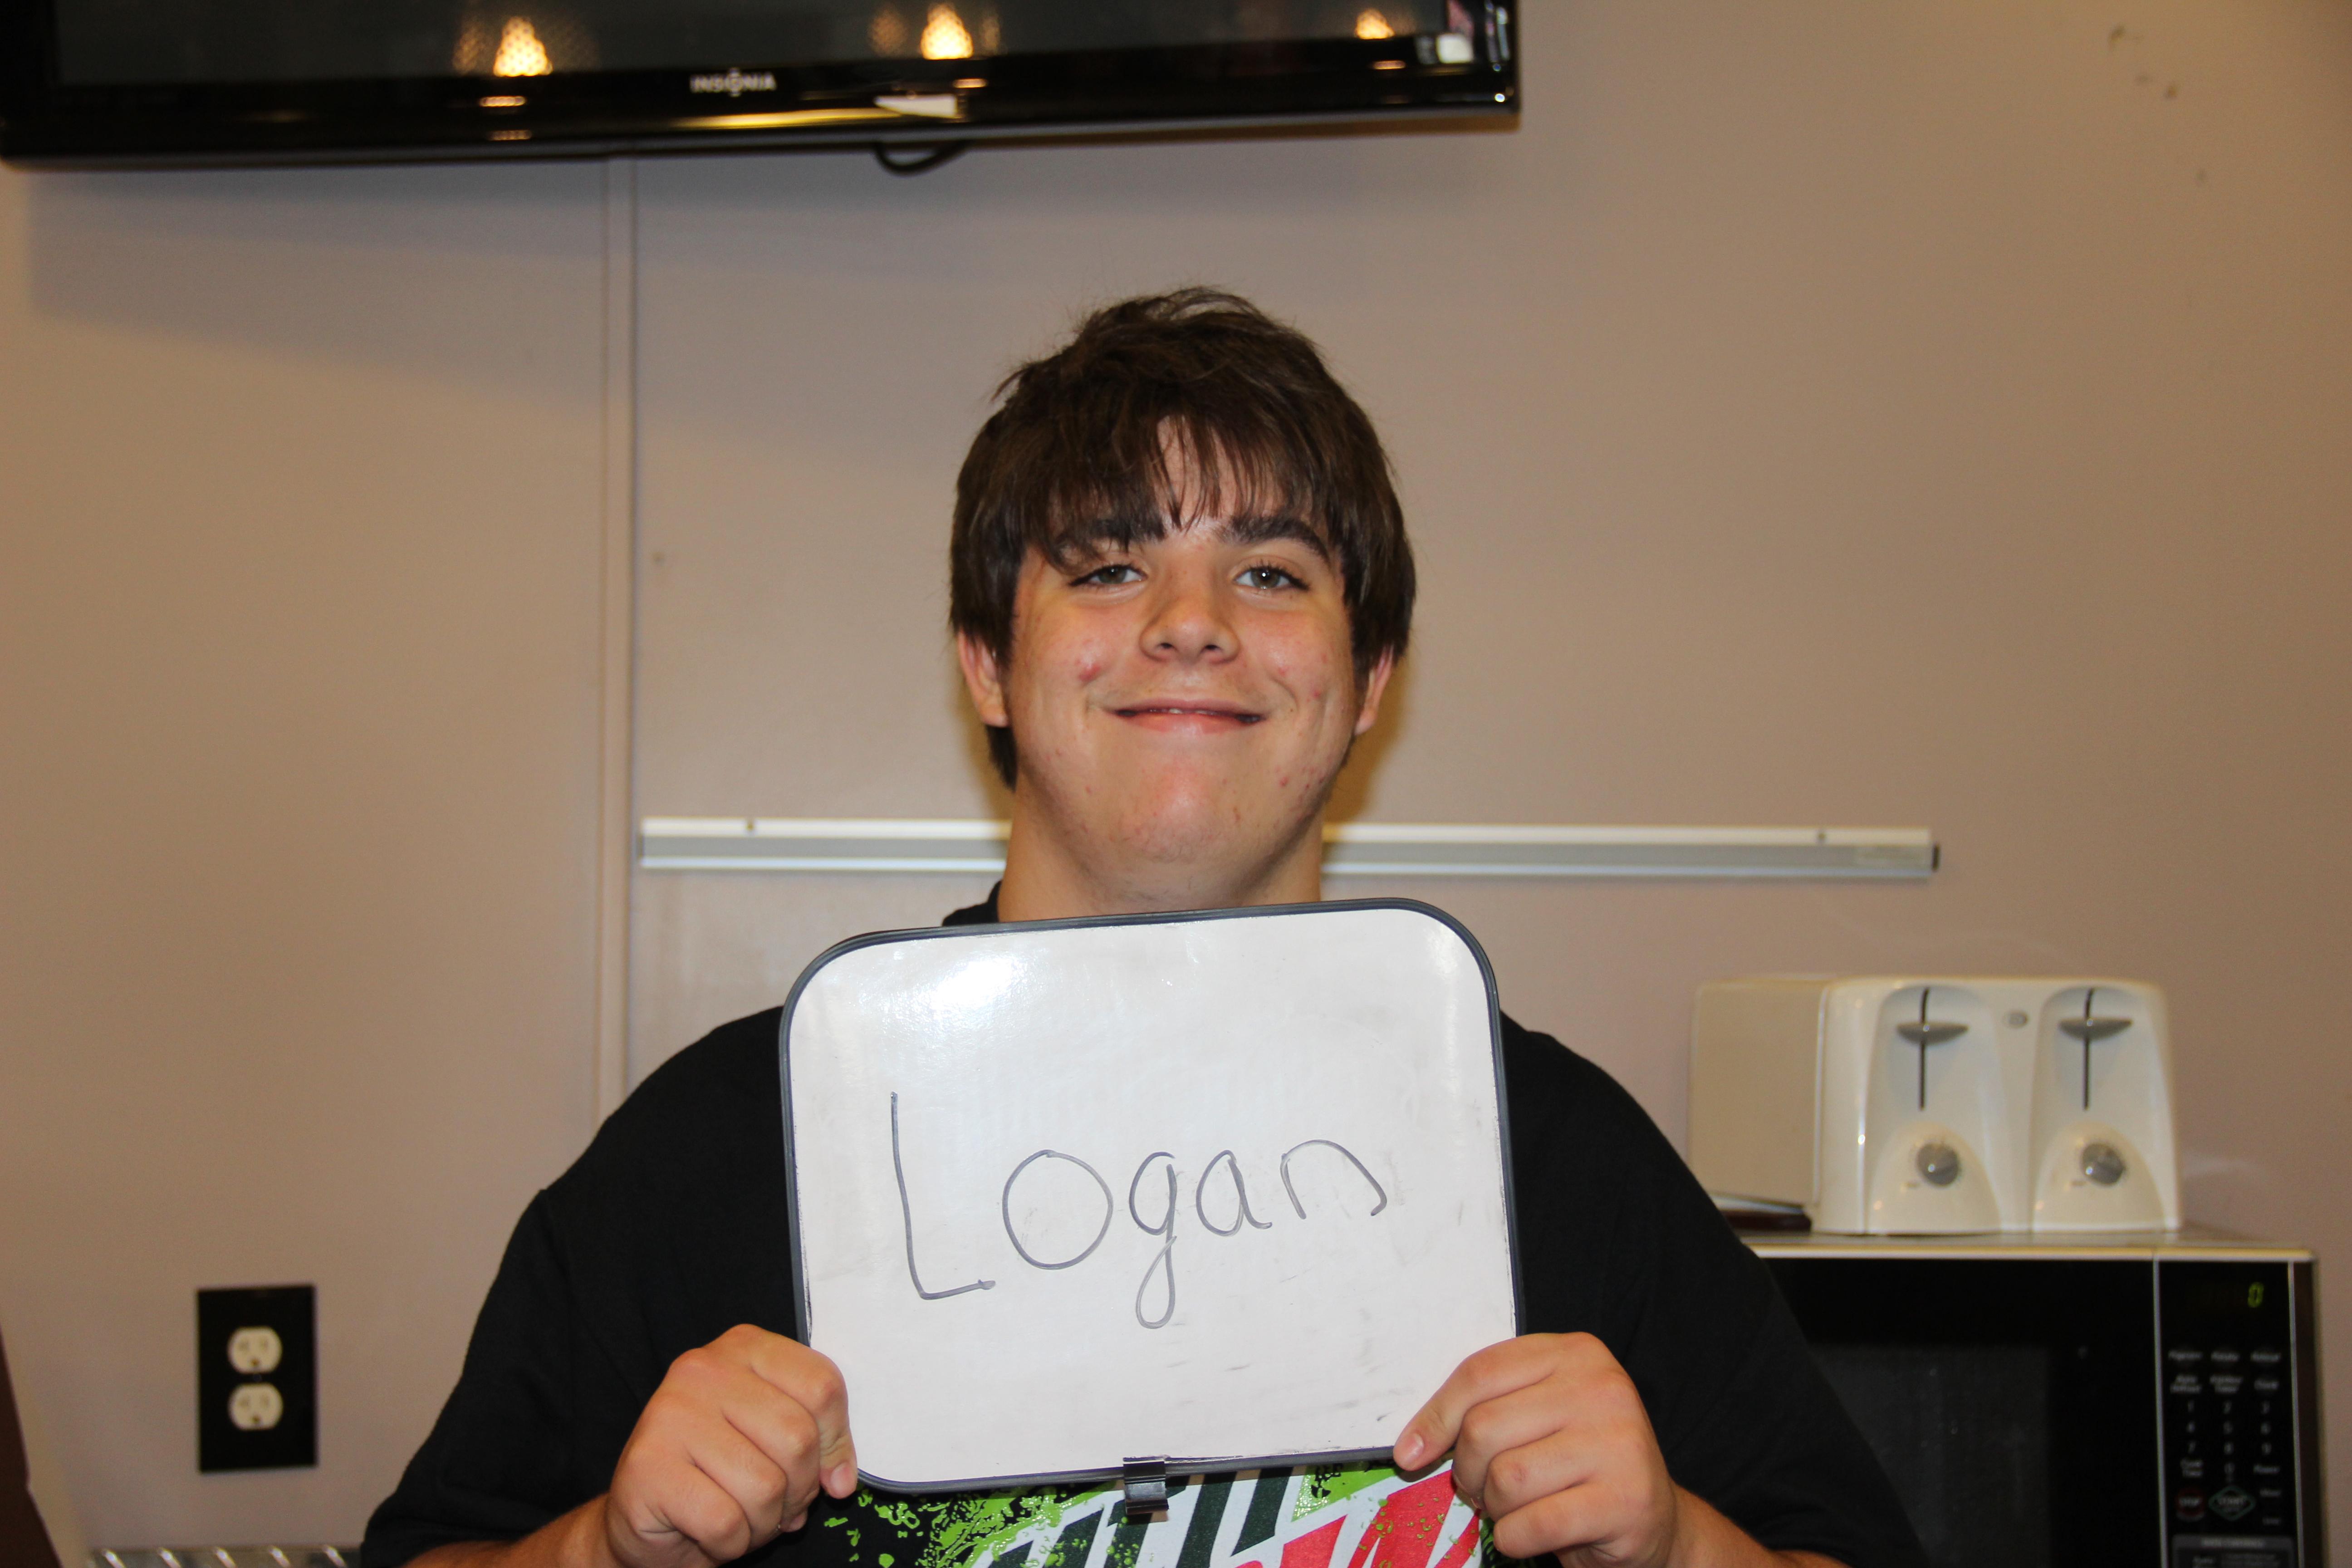 Logan.JPG